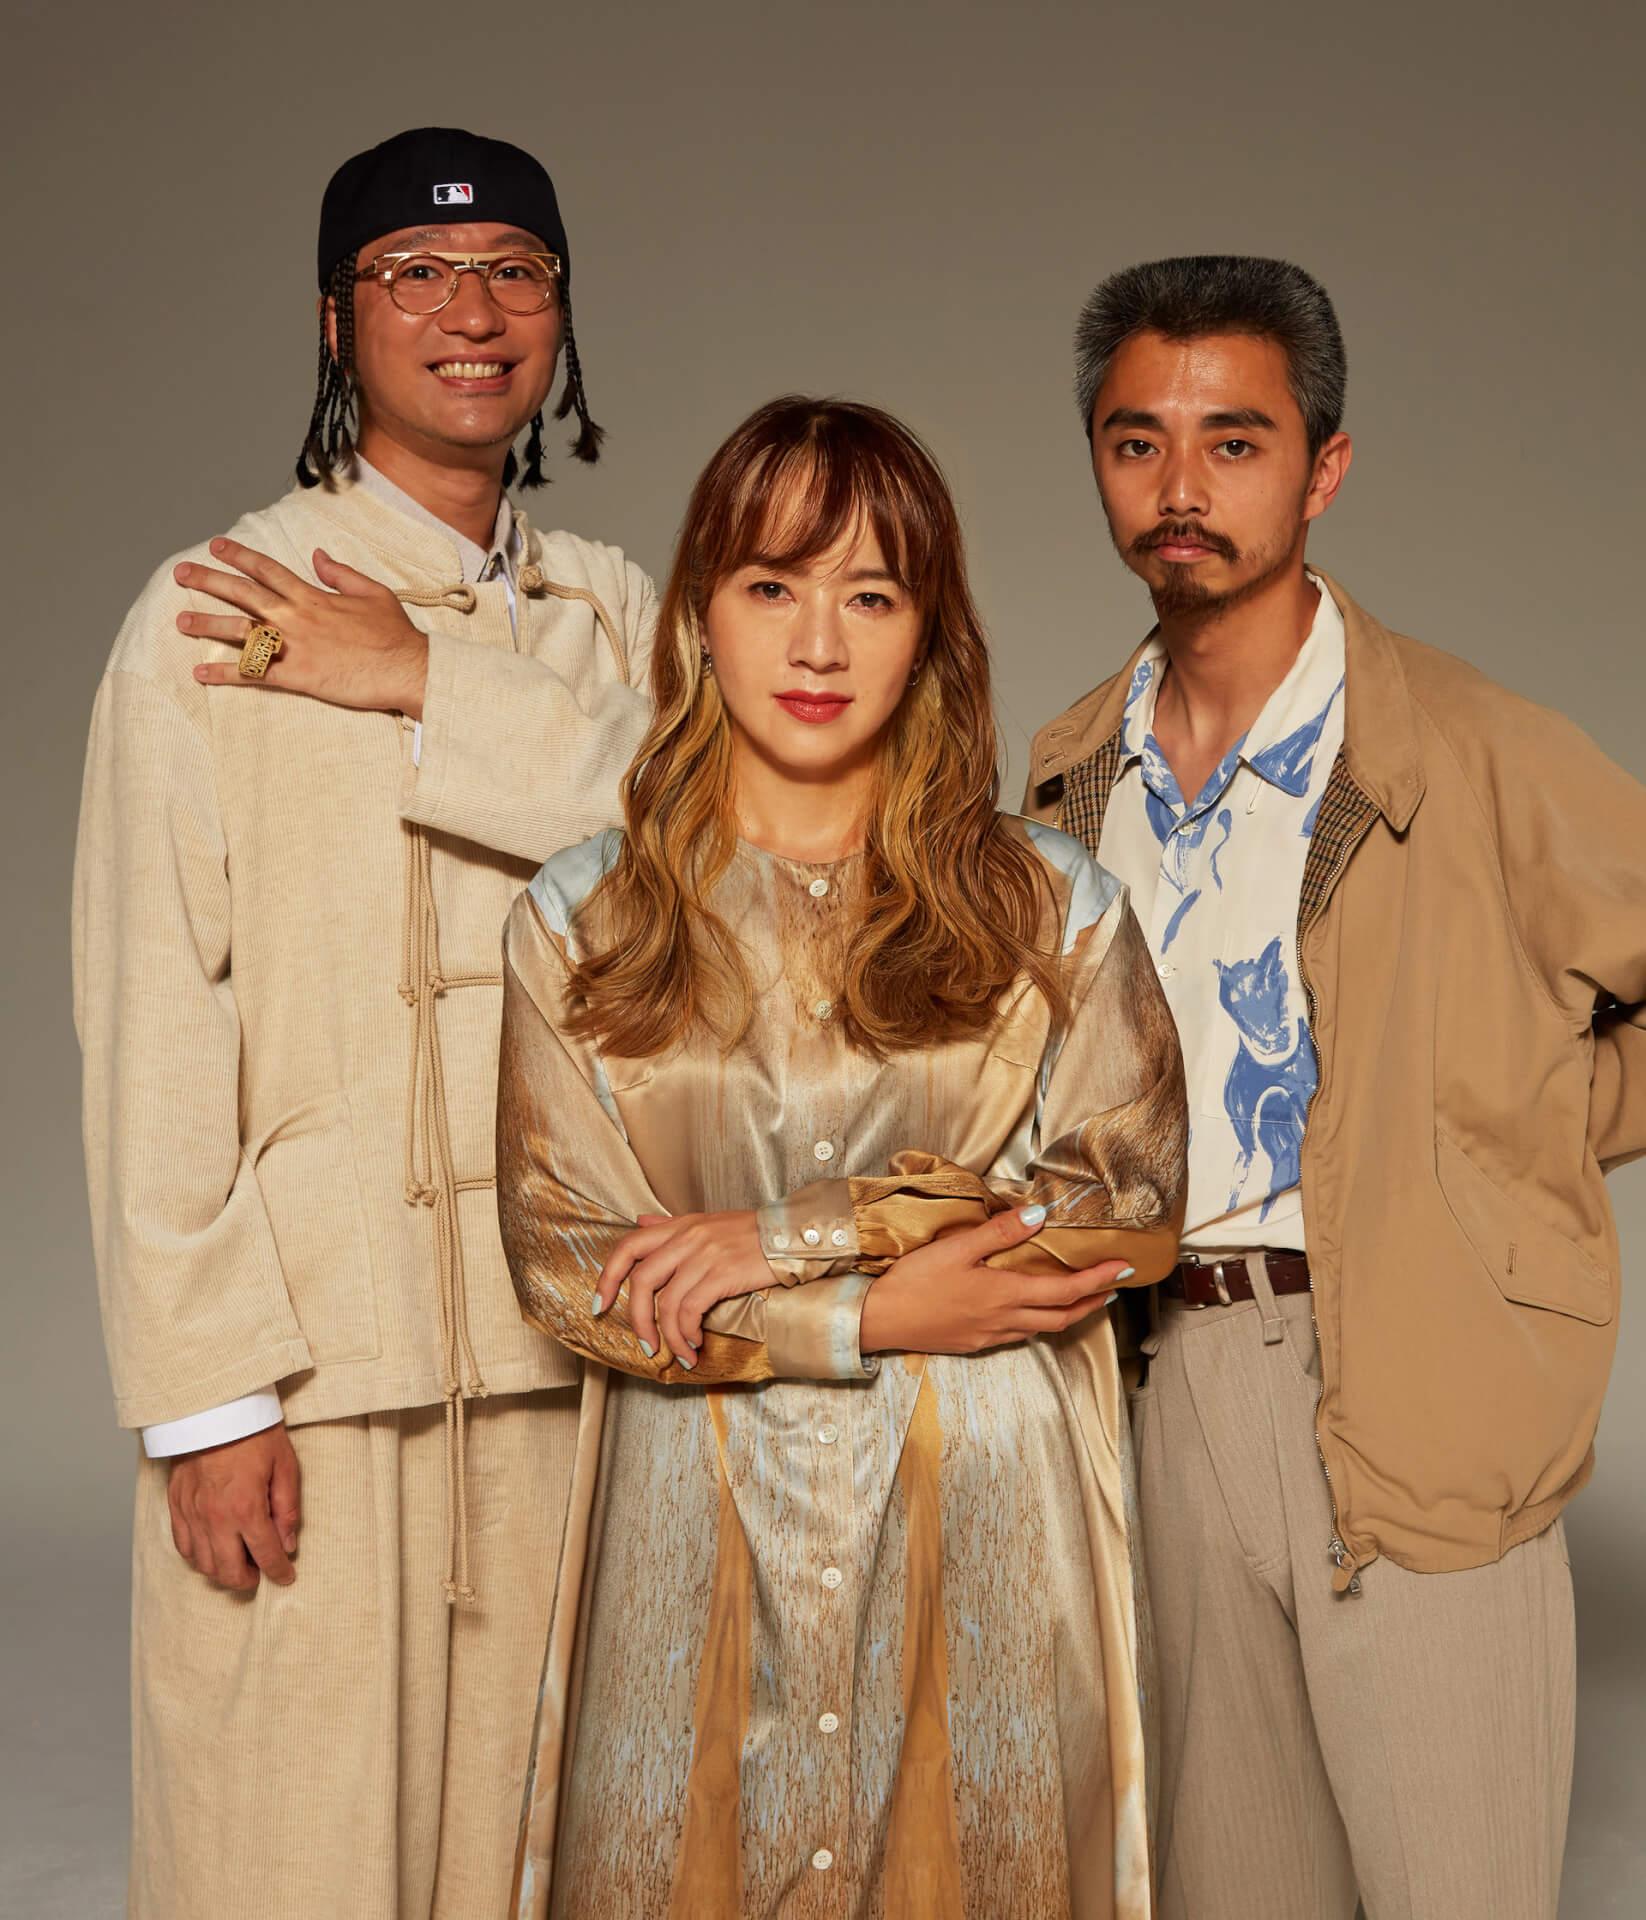 FNCYの2ndアルバムのタイトルが『FNCY BY FNCY』に決定!ジャケットアートも解禁&豪華特典も発表 music210806_fncy_1